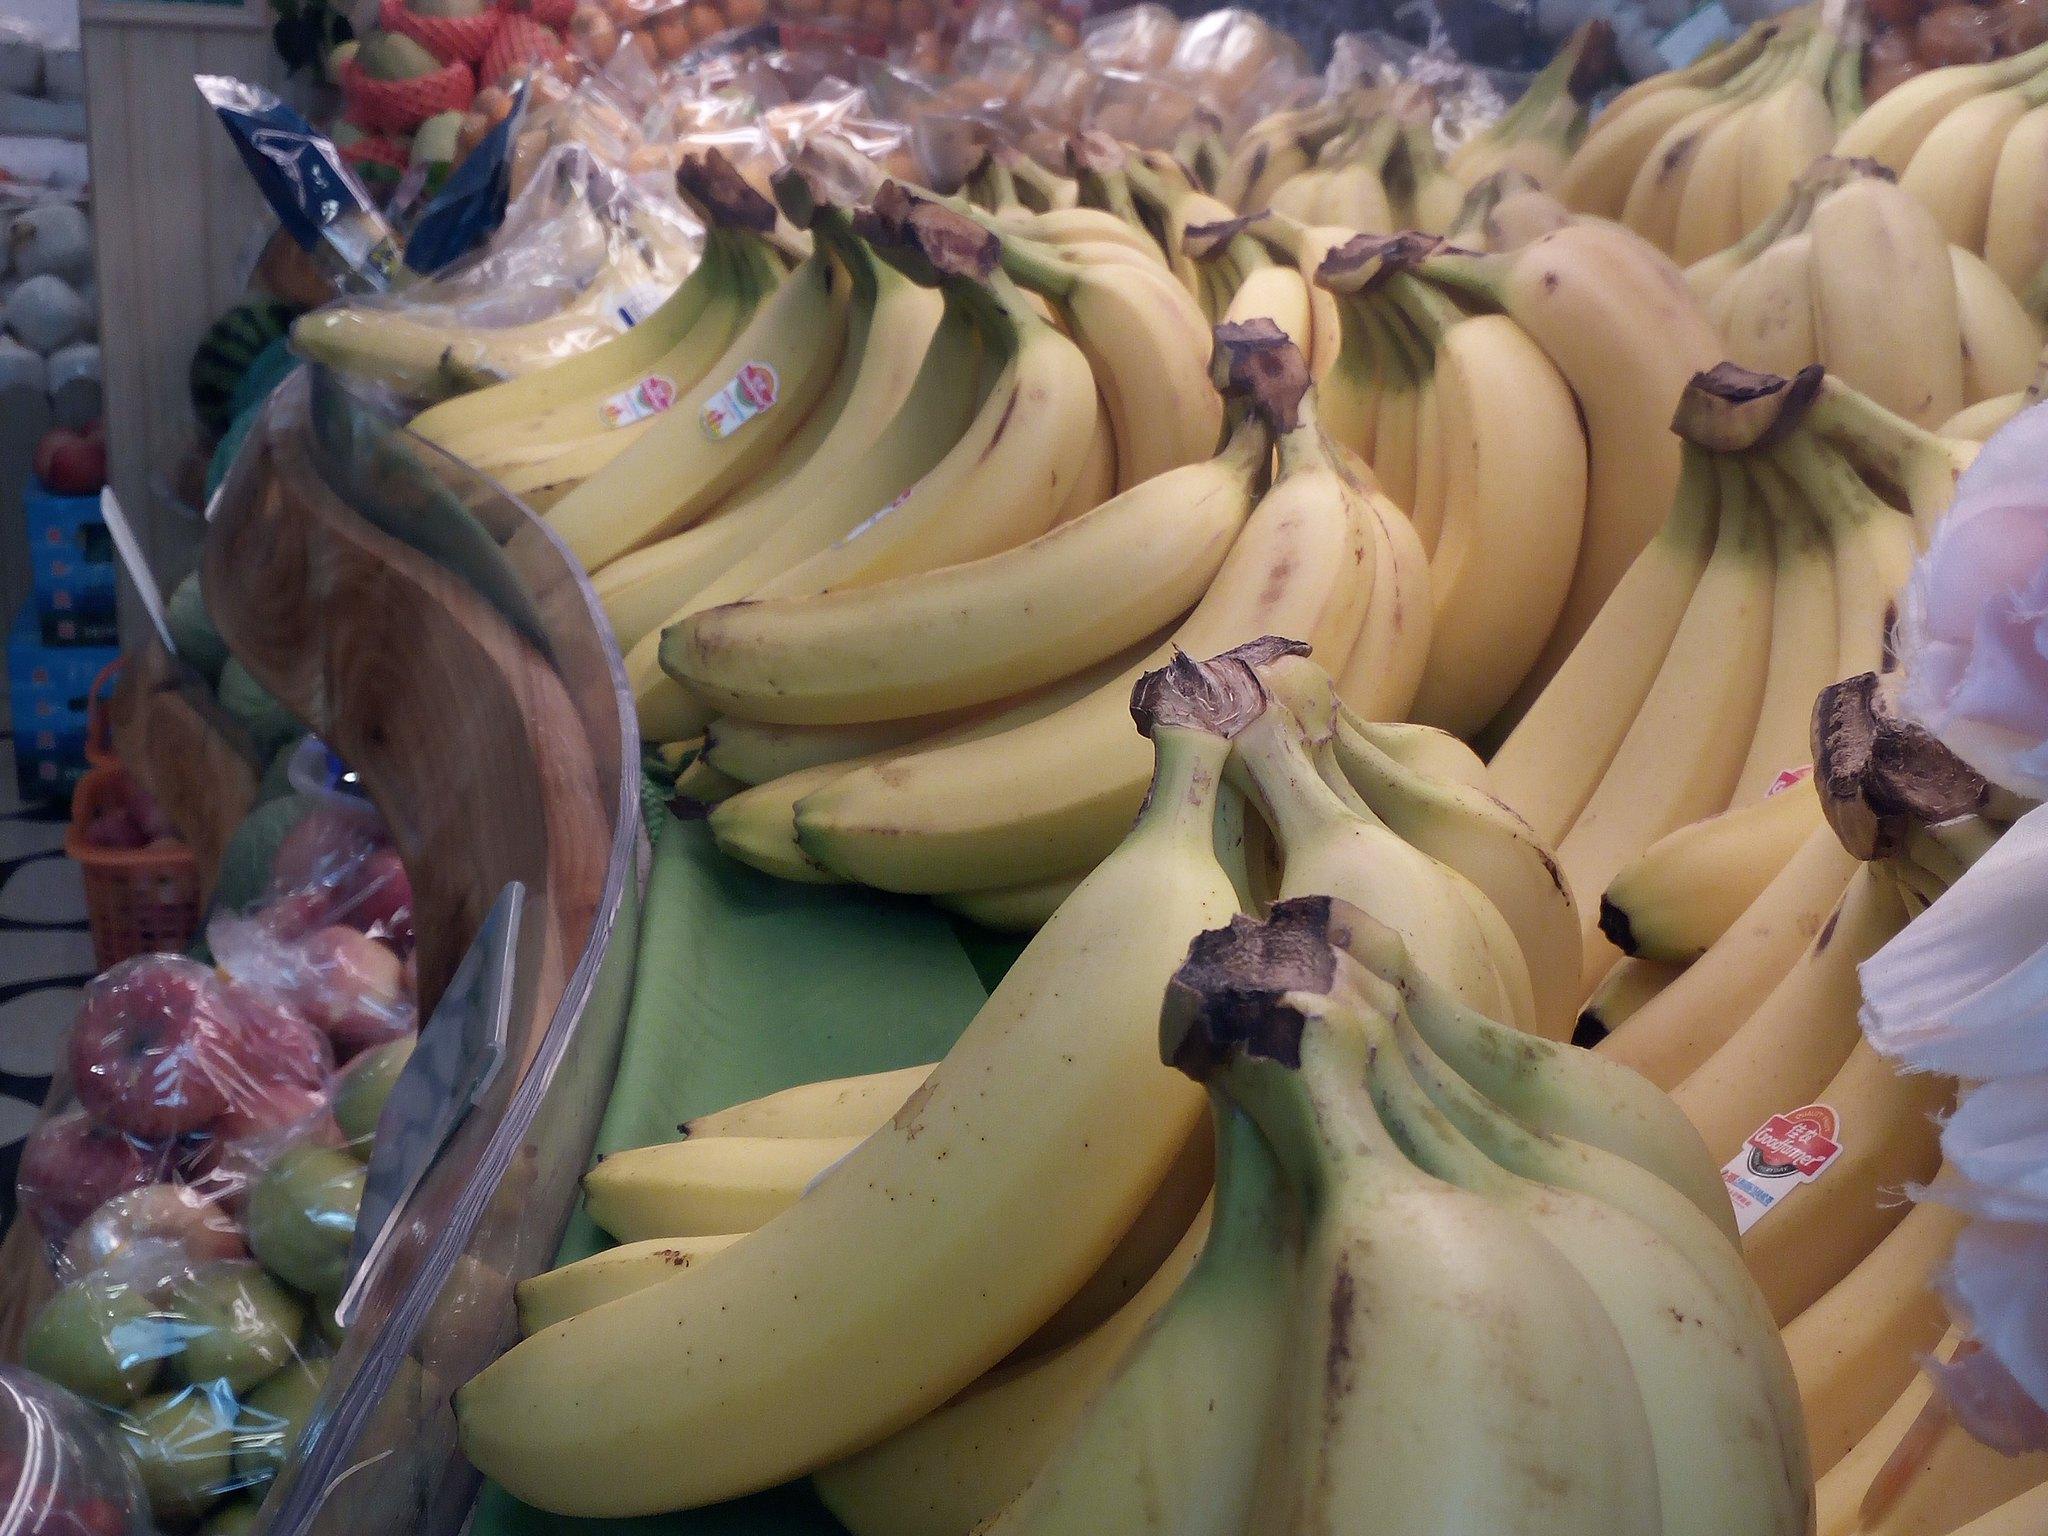 IMG_20180403_134246 EDIT (Going, bananas)